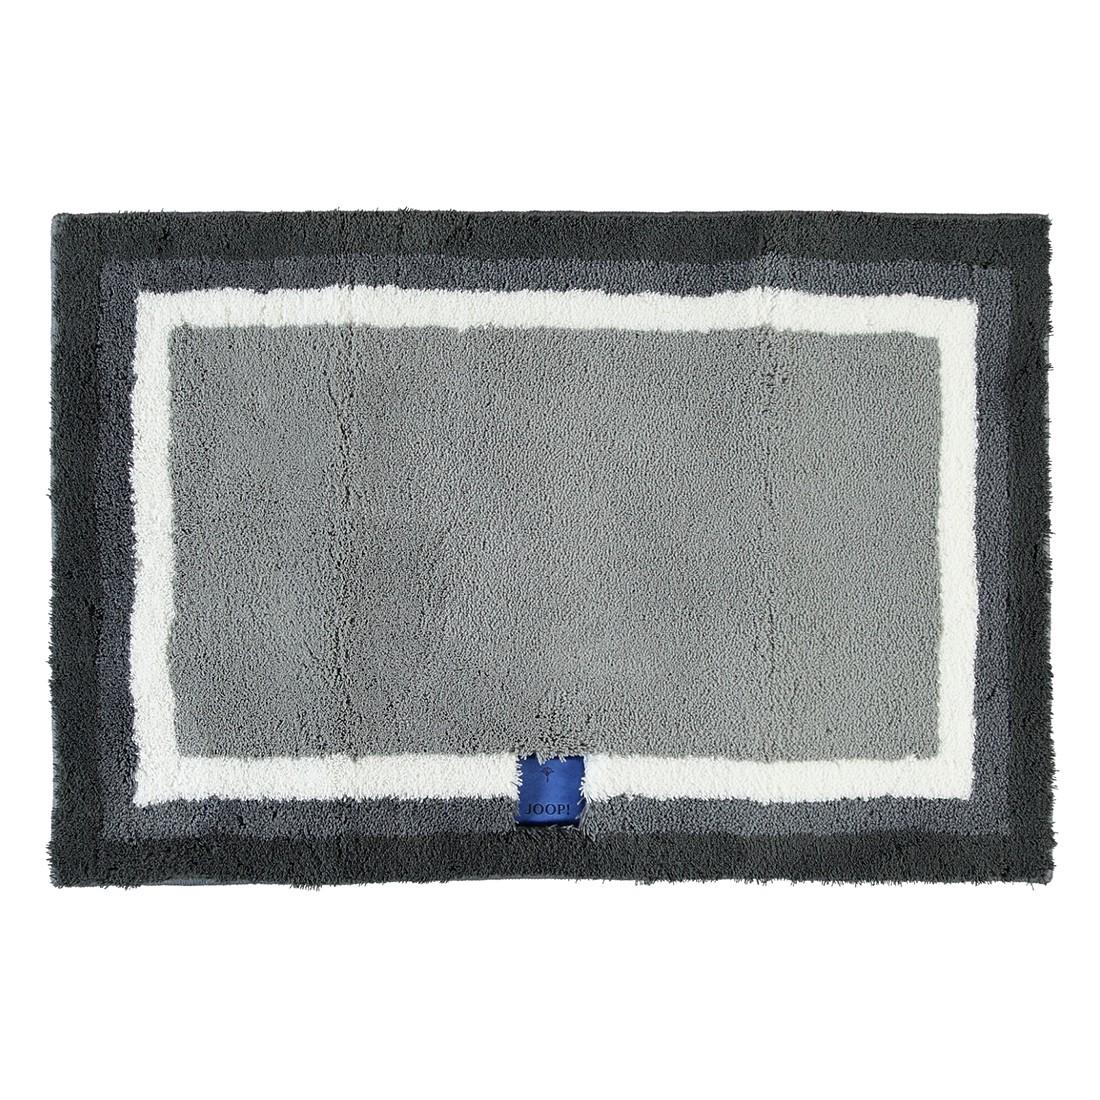 Badteppiche New Frame – Polyacryl – Kiesel – 70×120 cm, Joop kaufen